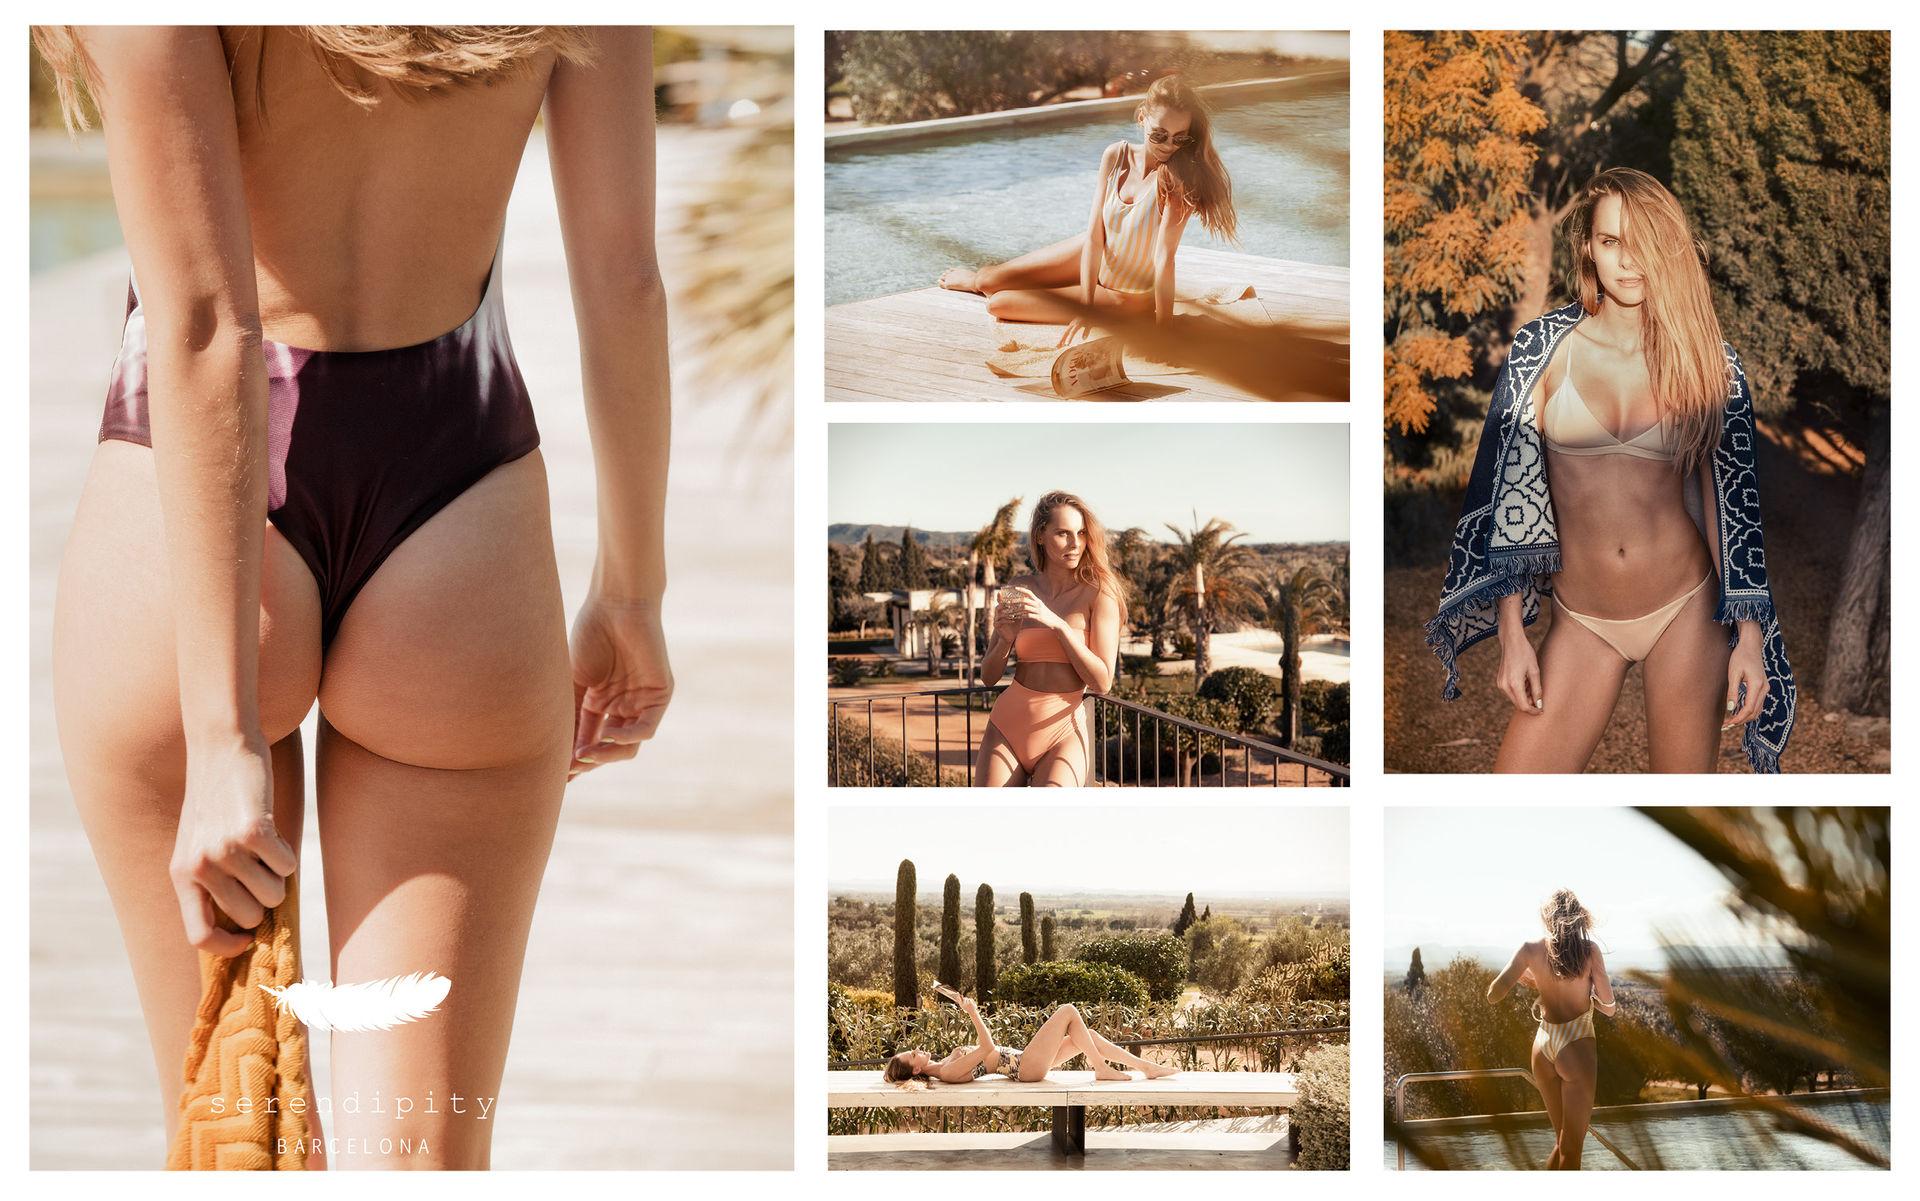 Markus-Henttonen-campaigns-Swimwear